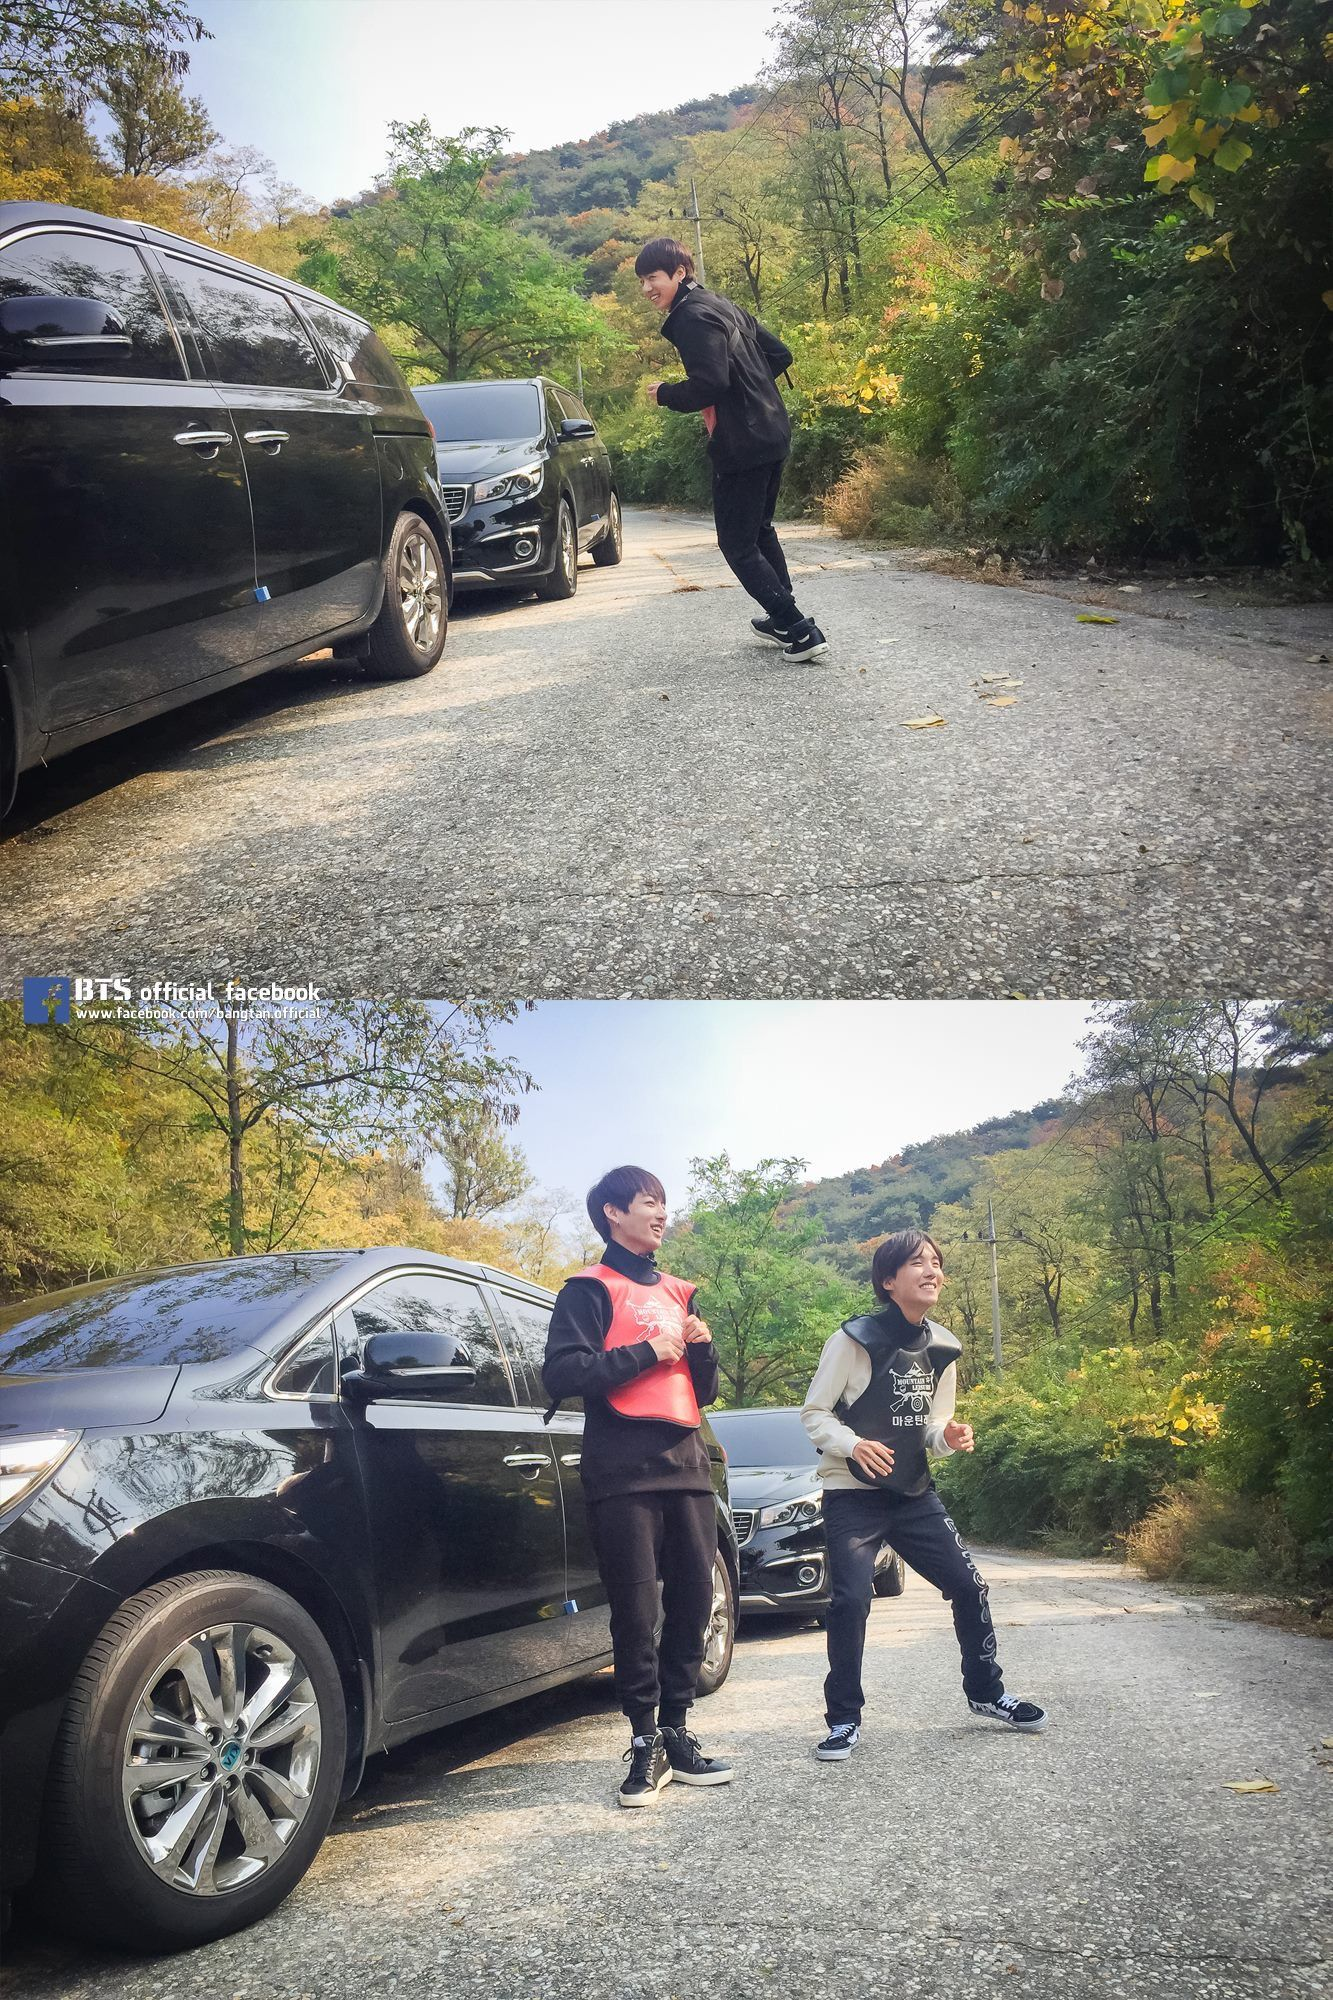 Jungkook and J-Hope- BTS [#V앱 비하인드]  숨소리만 가득했던 V앱 달려라방탄 서바이벌 편- 비하인드 업데이트!